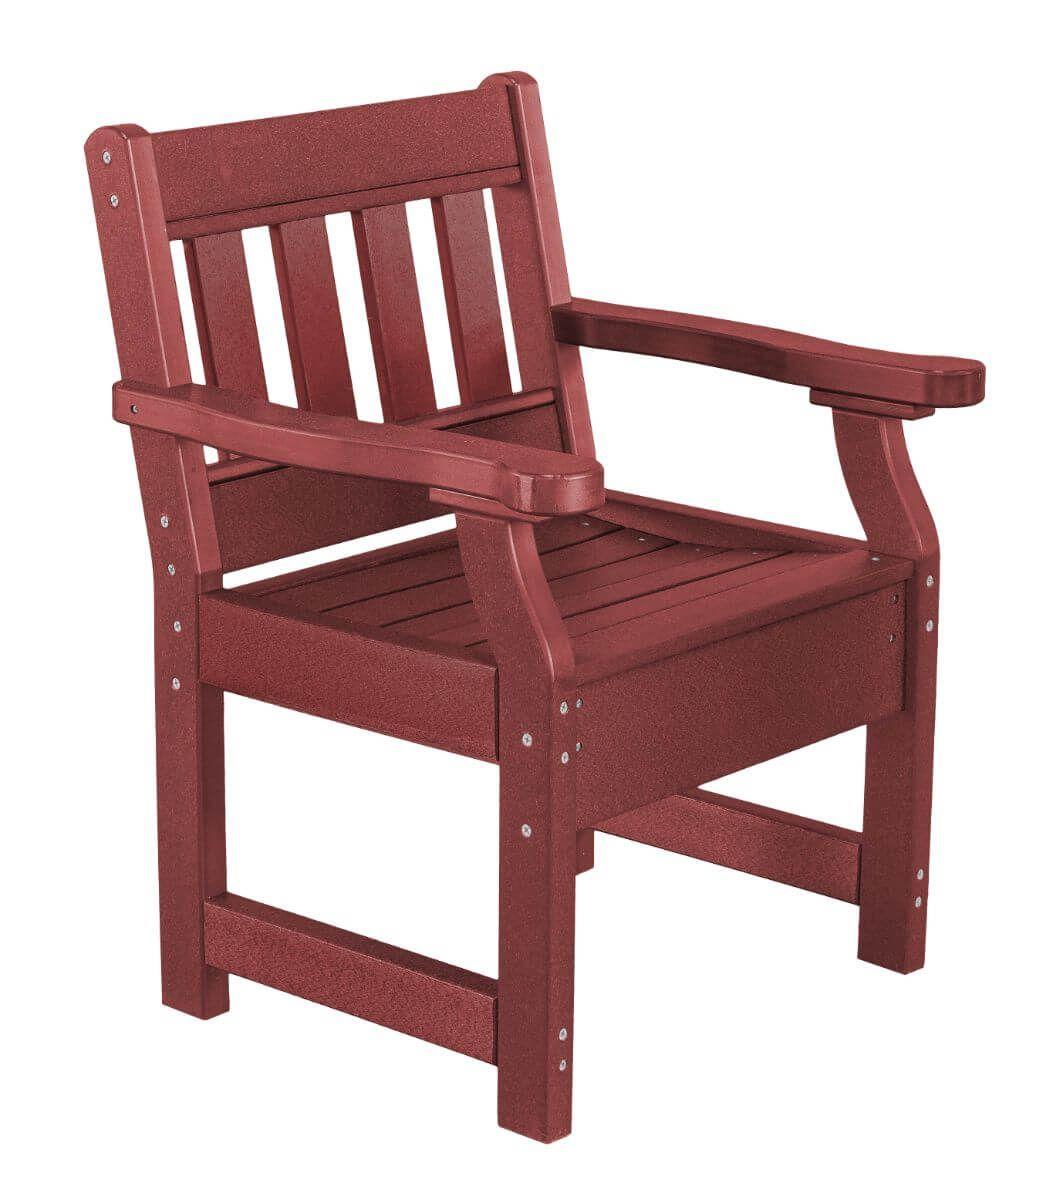 Cherry Wood Aden Patio Chair